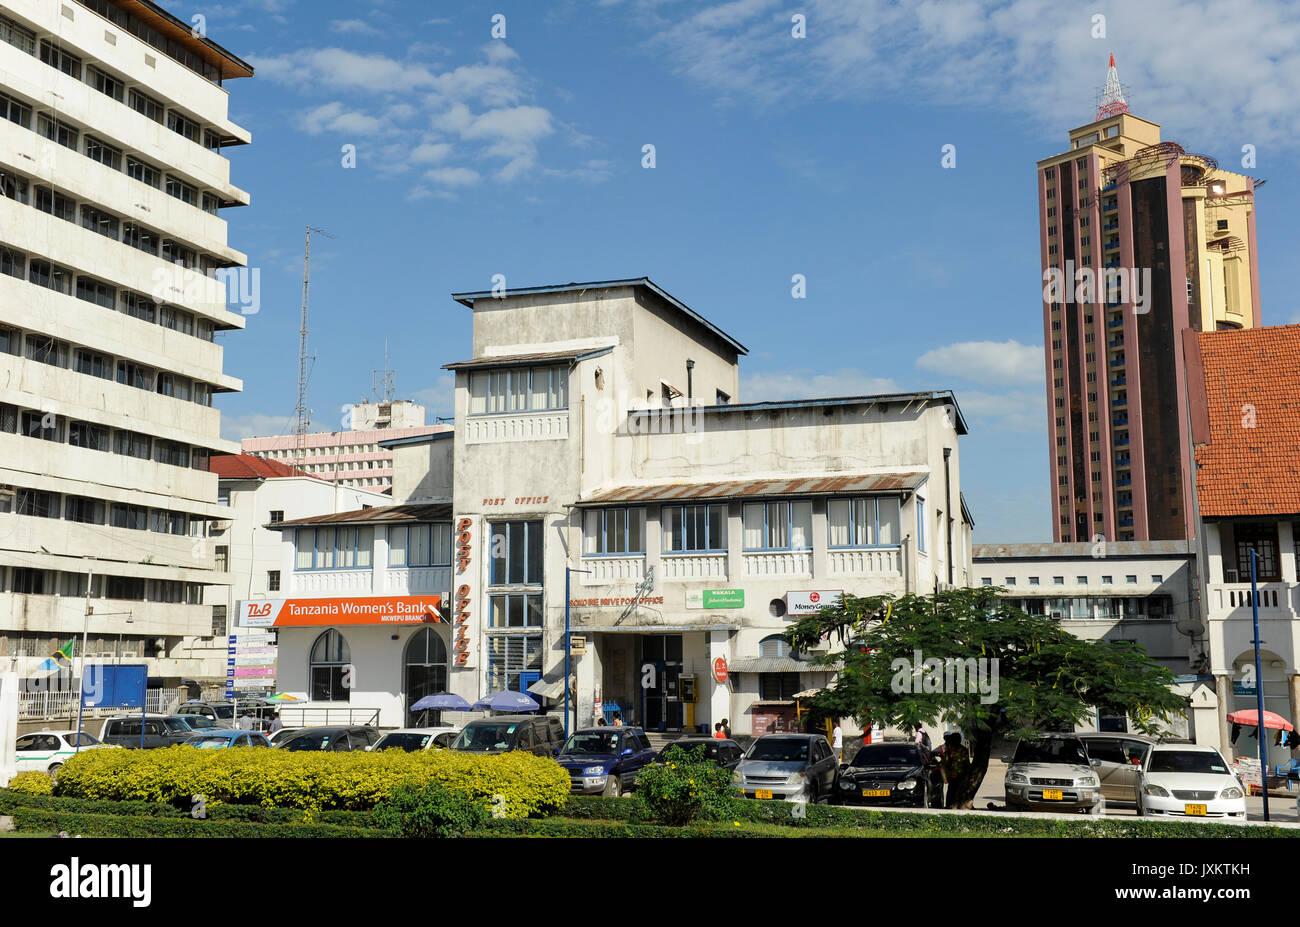 Tanzanie Dar es Salaam , old post office / Tanzanie Dar es Salam, Postamt Photo Stock